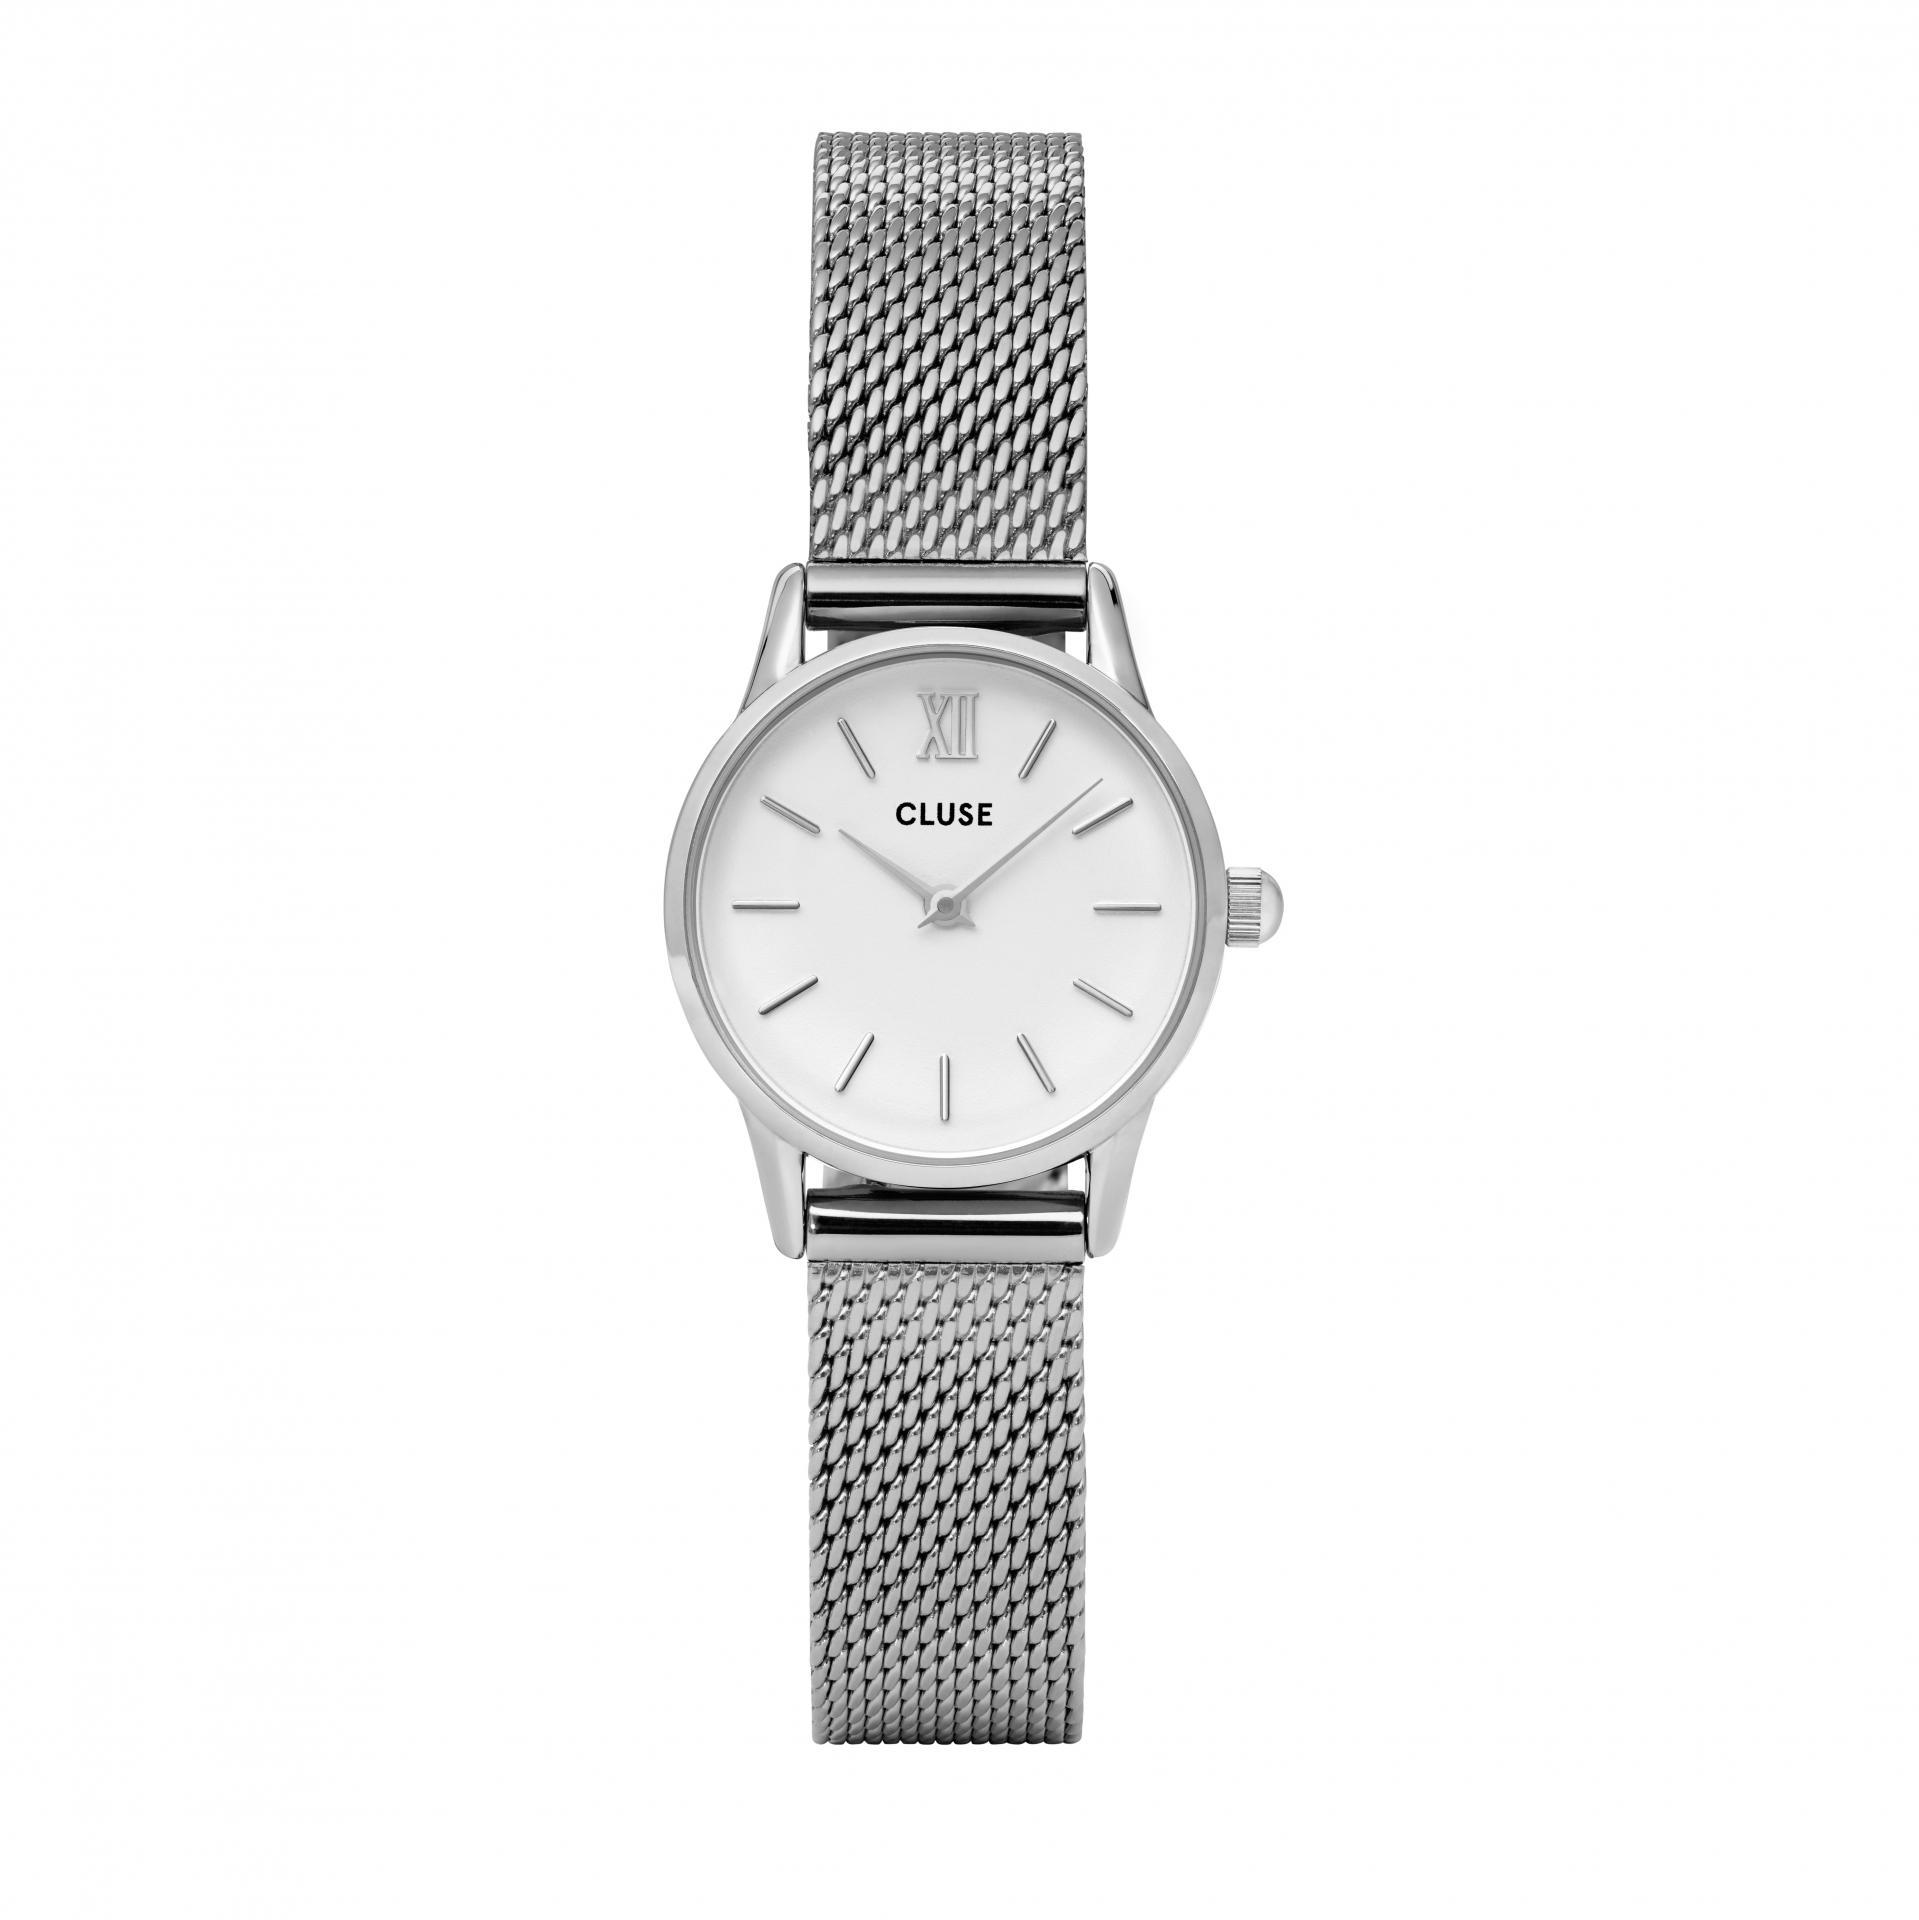 CLUSE Hodinky Cluse La Vedette Mesh Silver/White, stříbrná barva, kov